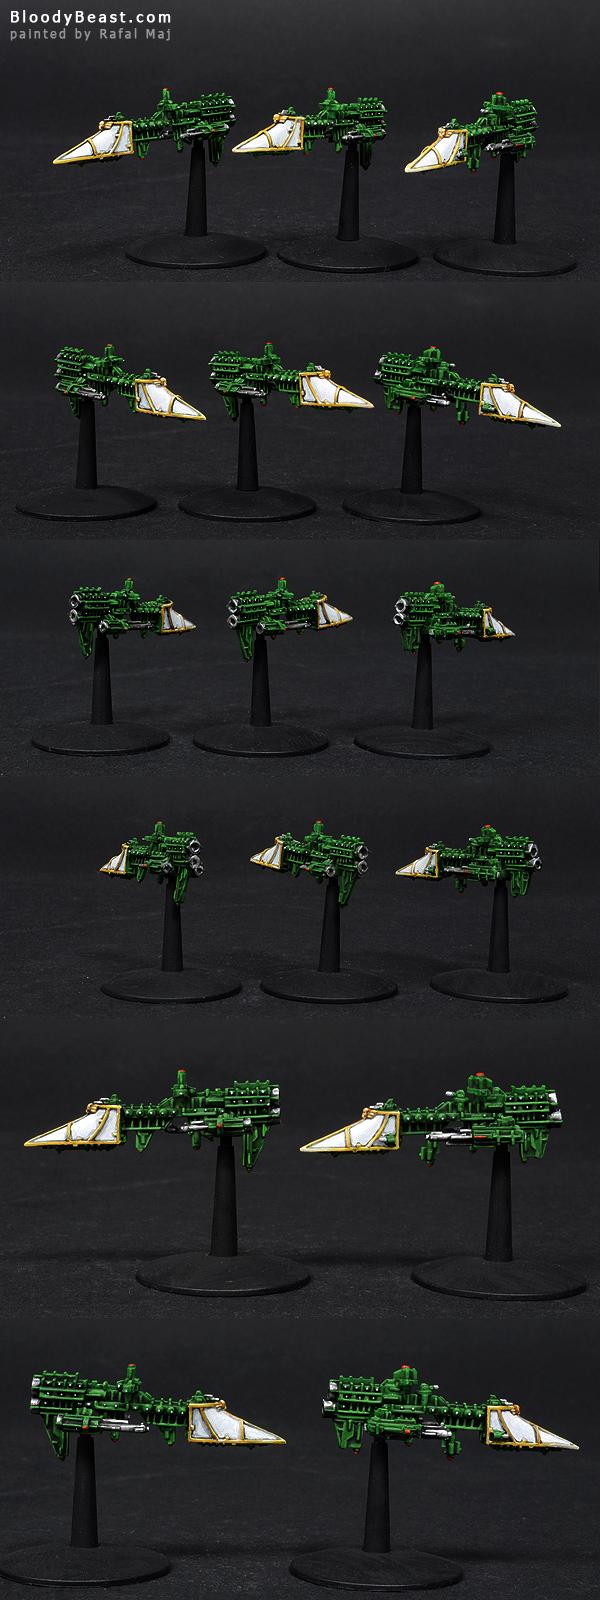 Imperial Sword Class Frigate painted by Rafal Maj (BloodyBeast.com)